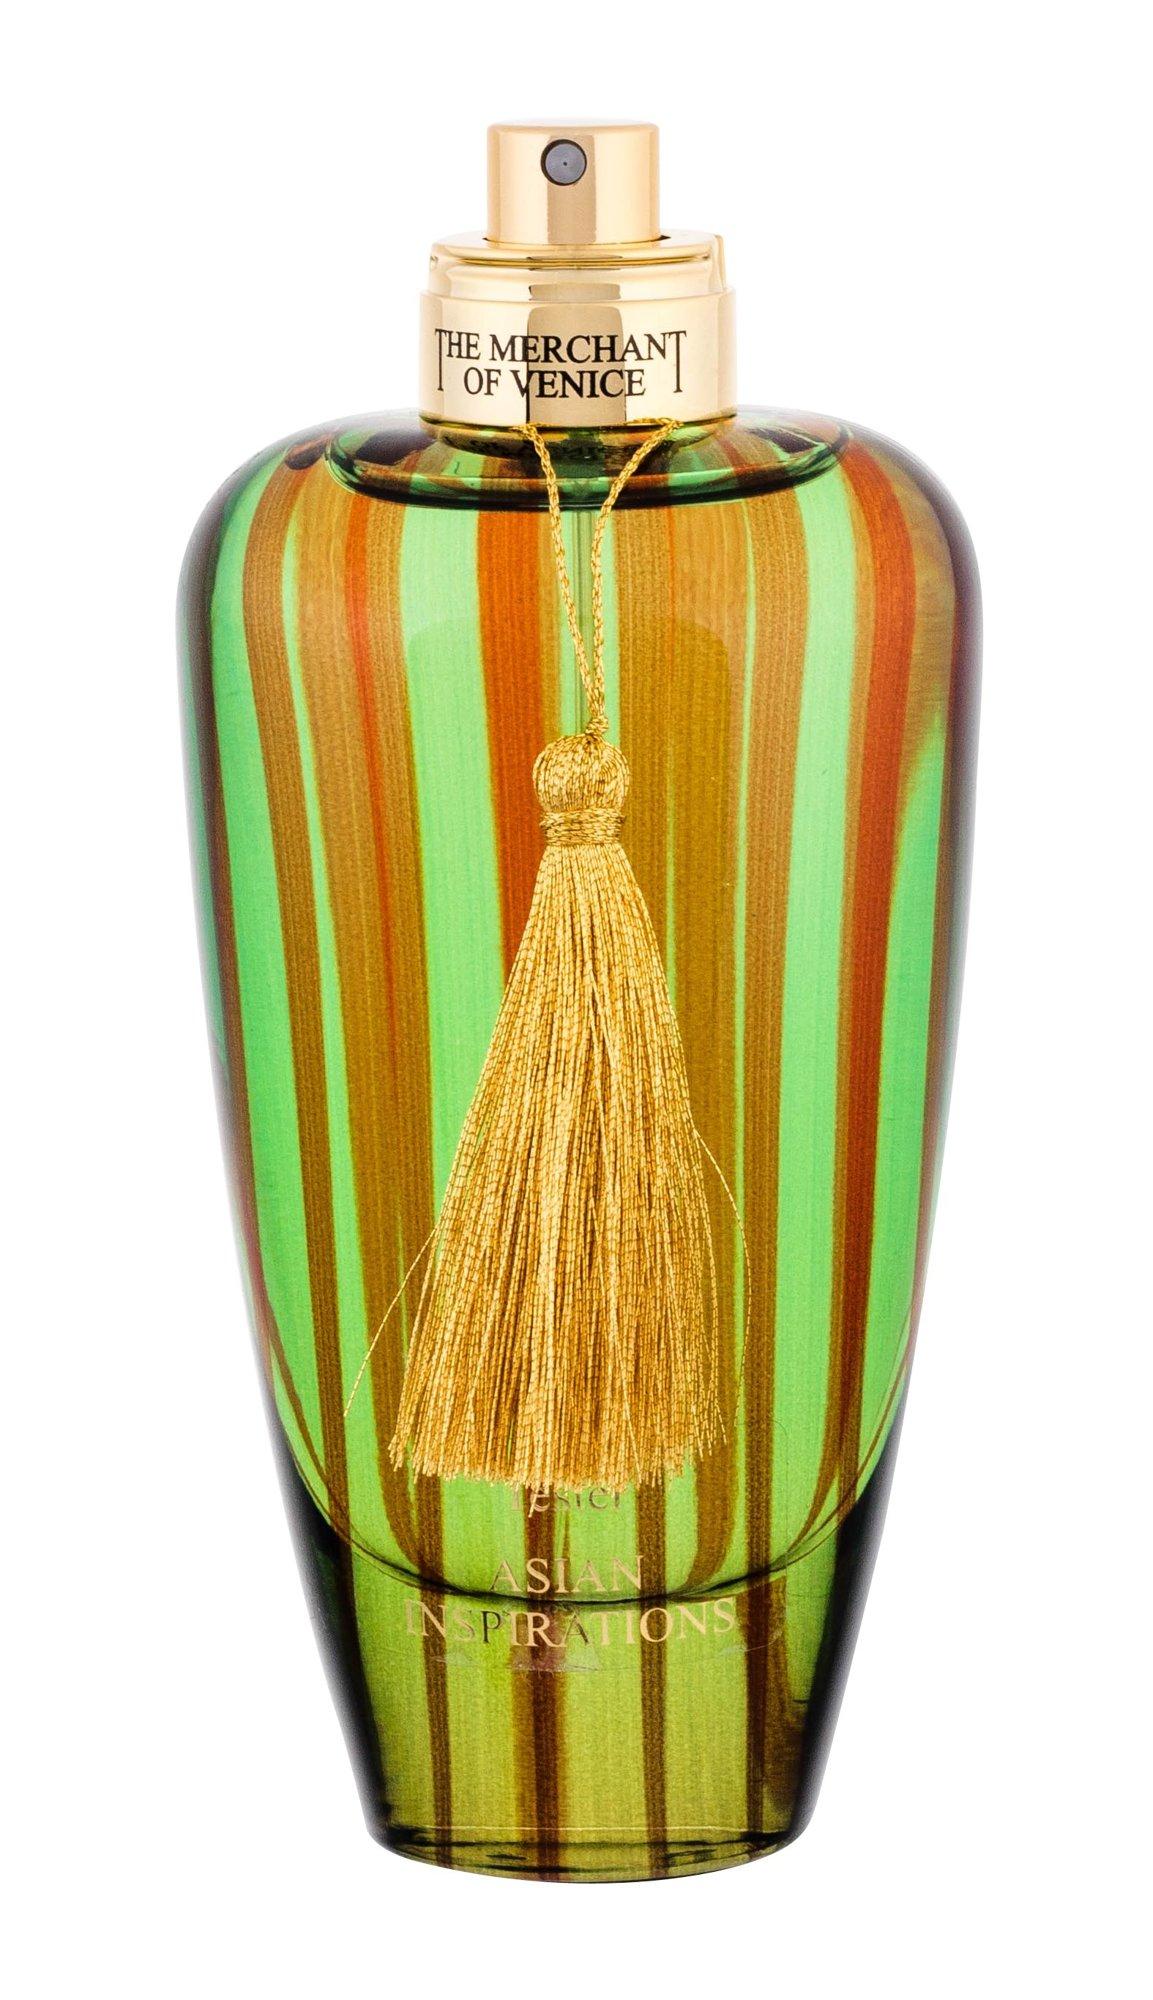 The Merchant of Venice Asian Inspirations Eau de Parfum 100ml